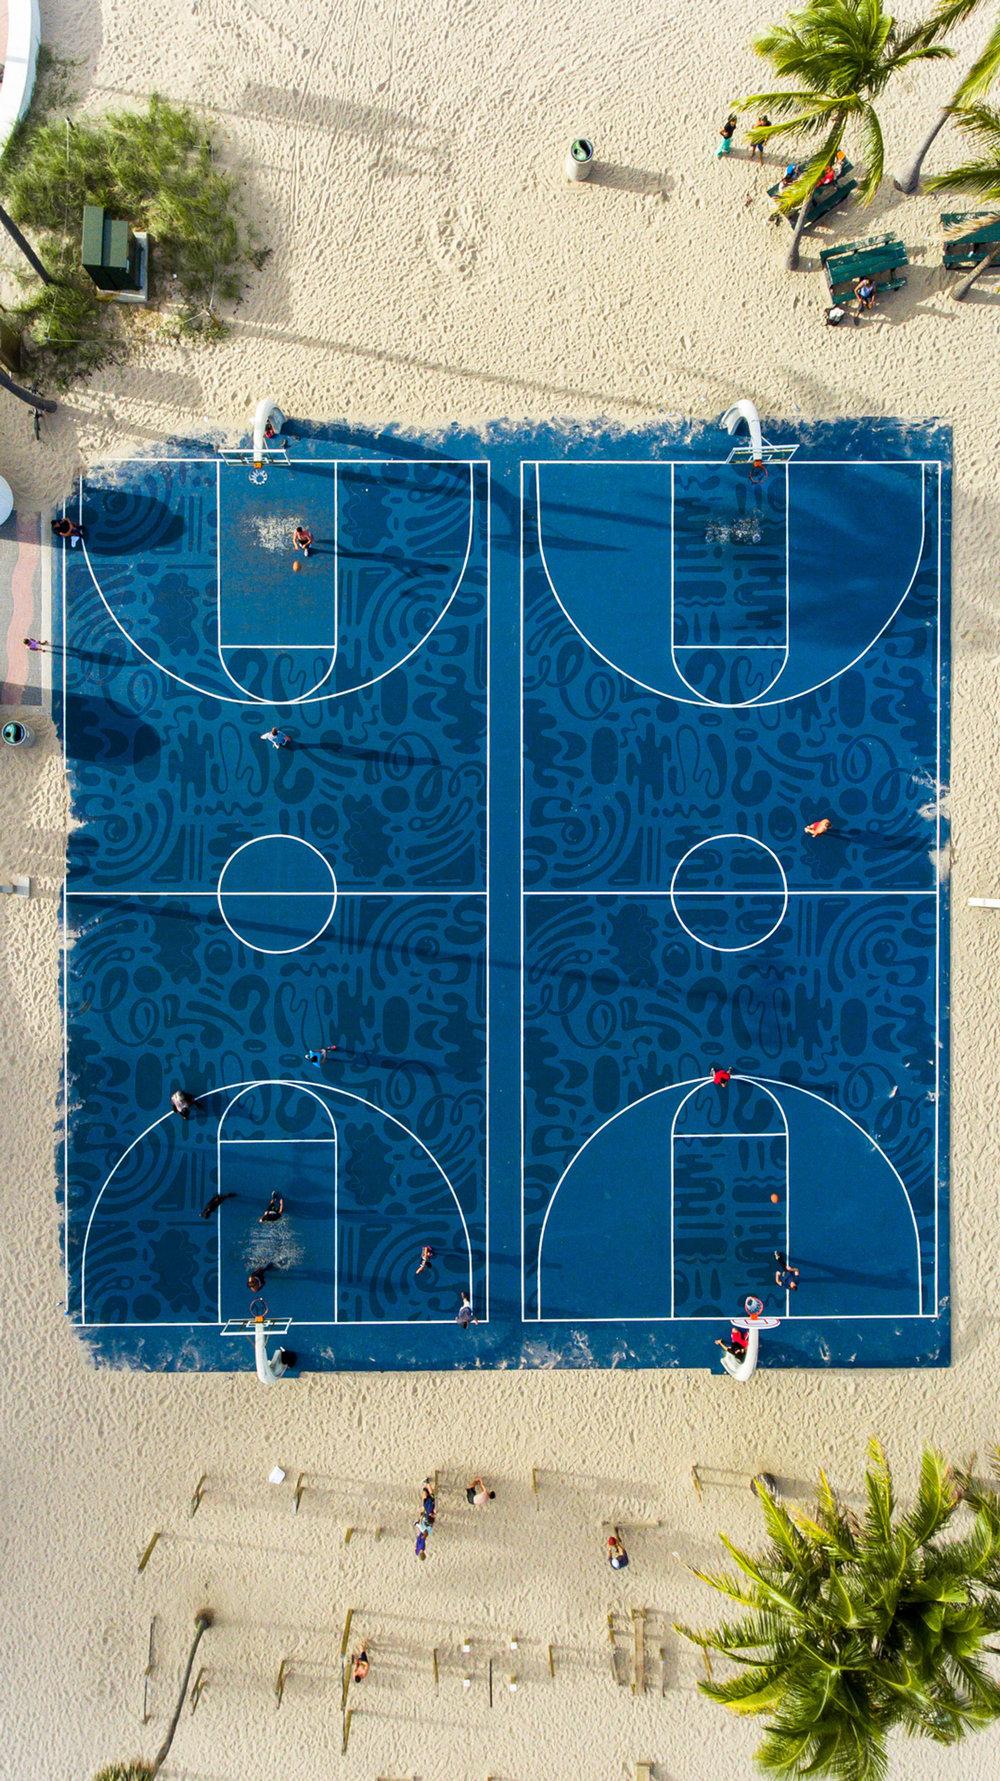 BasketballCourt_Pattern_Portrait.jpg